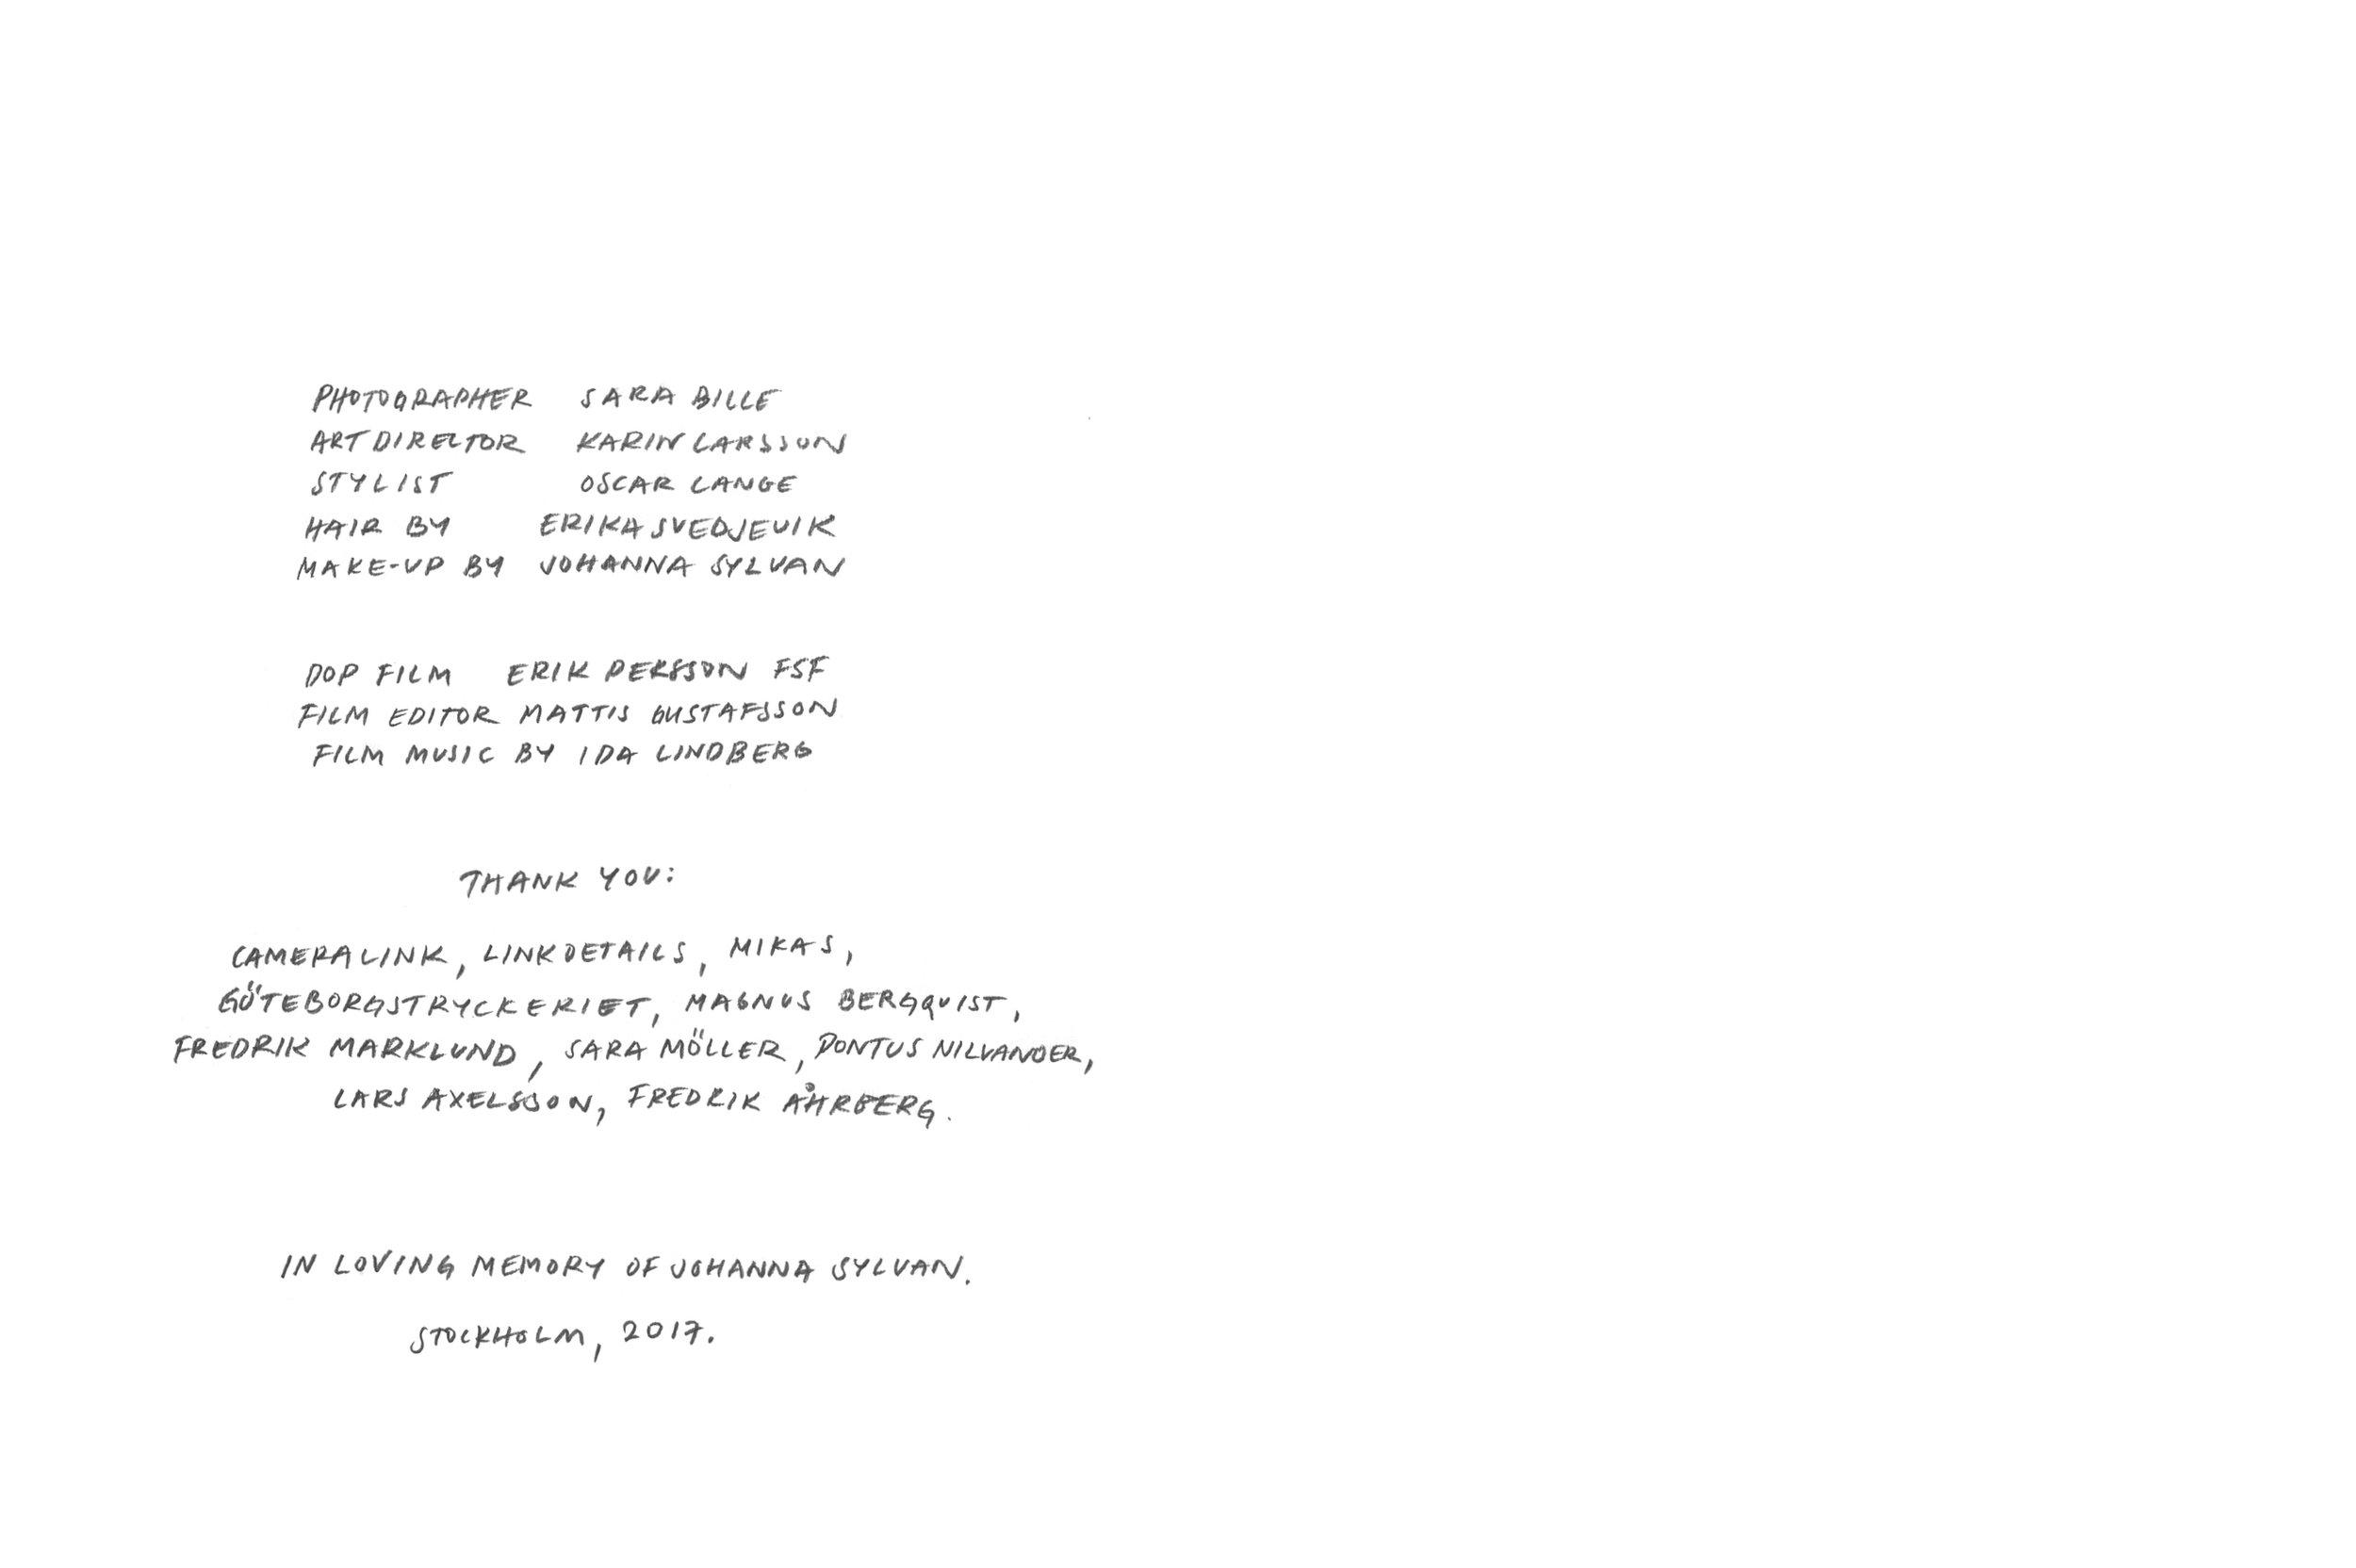 Bille_layout_finalen26.jpg